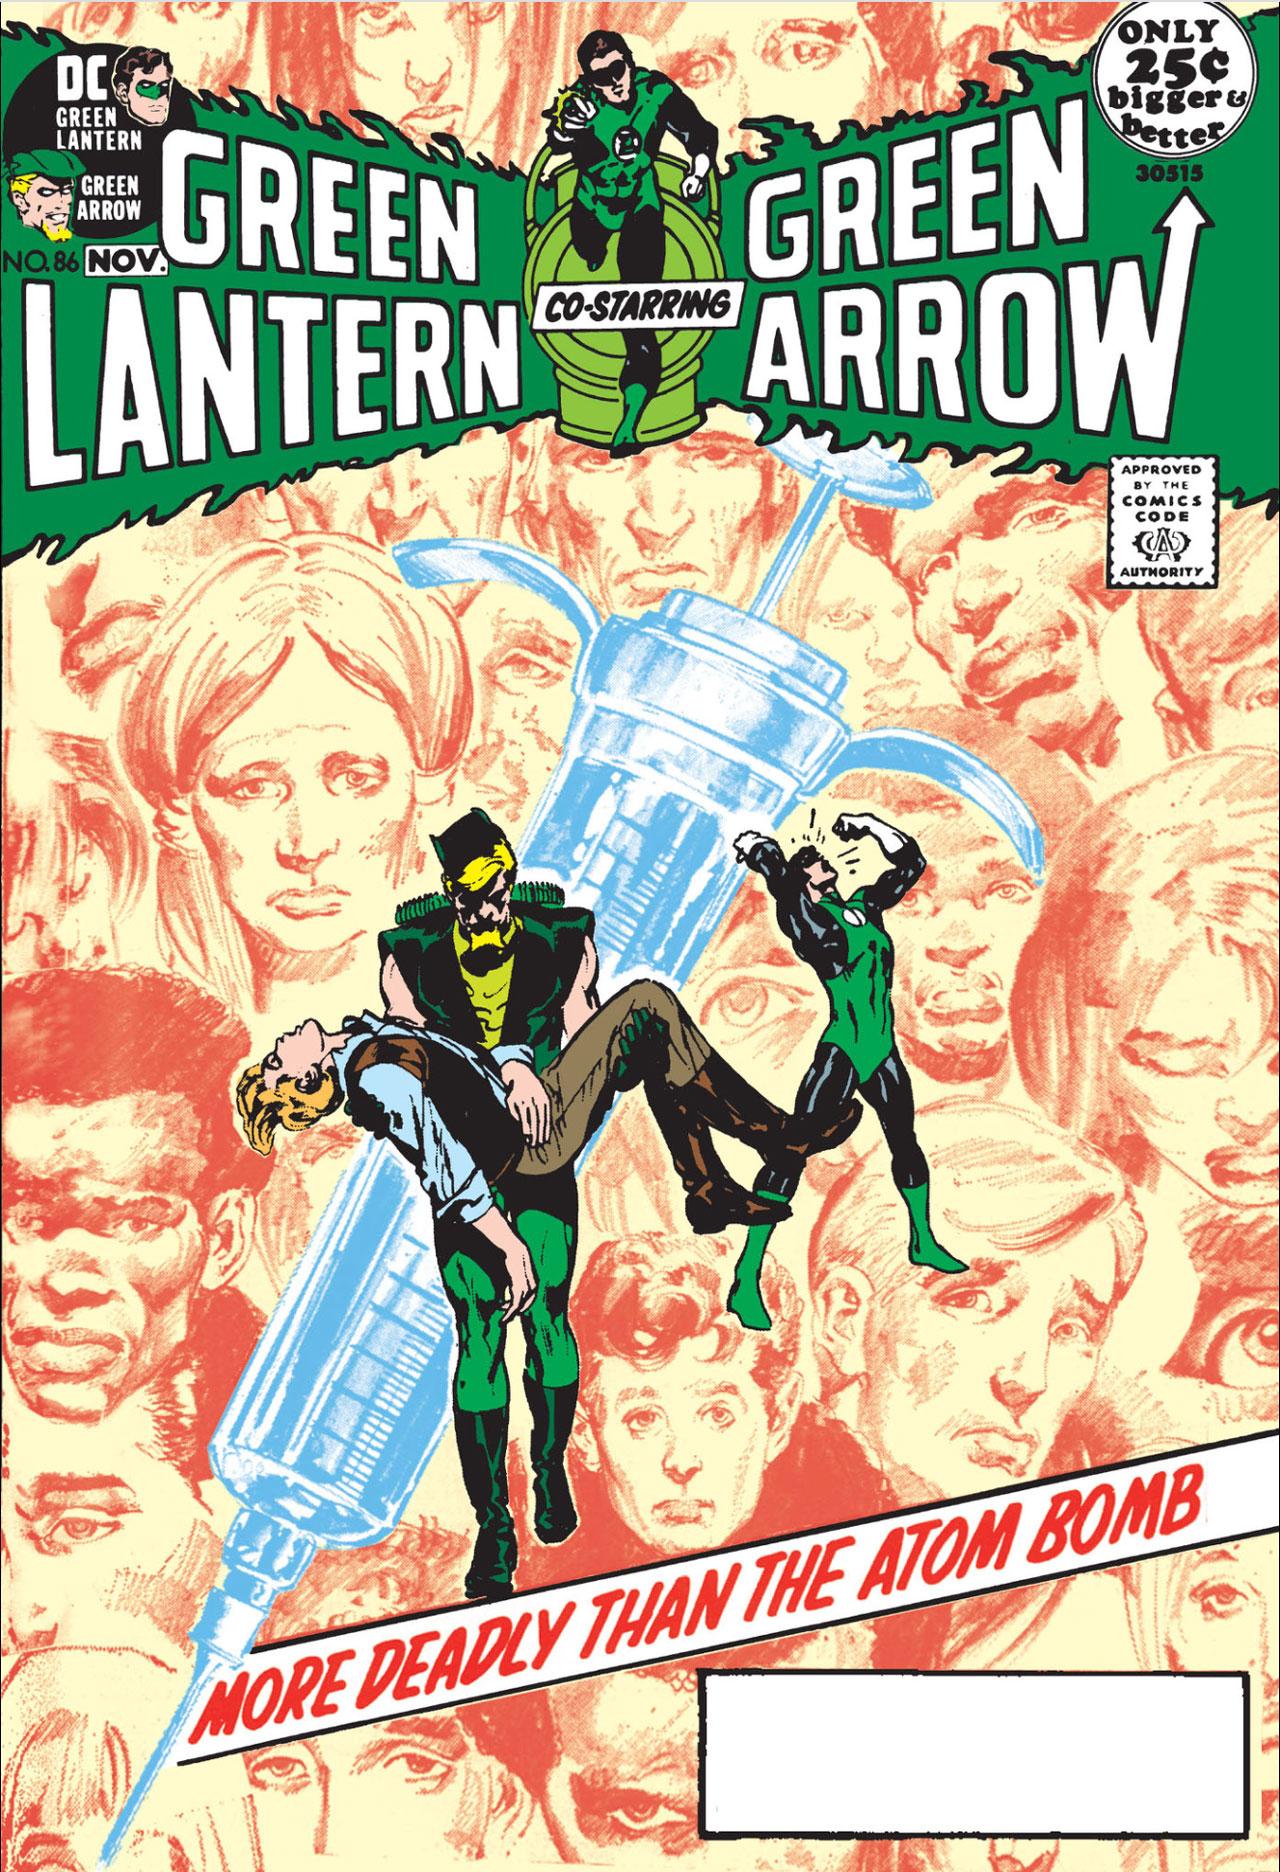 Green-Lantern-Green-Arrow.jpg